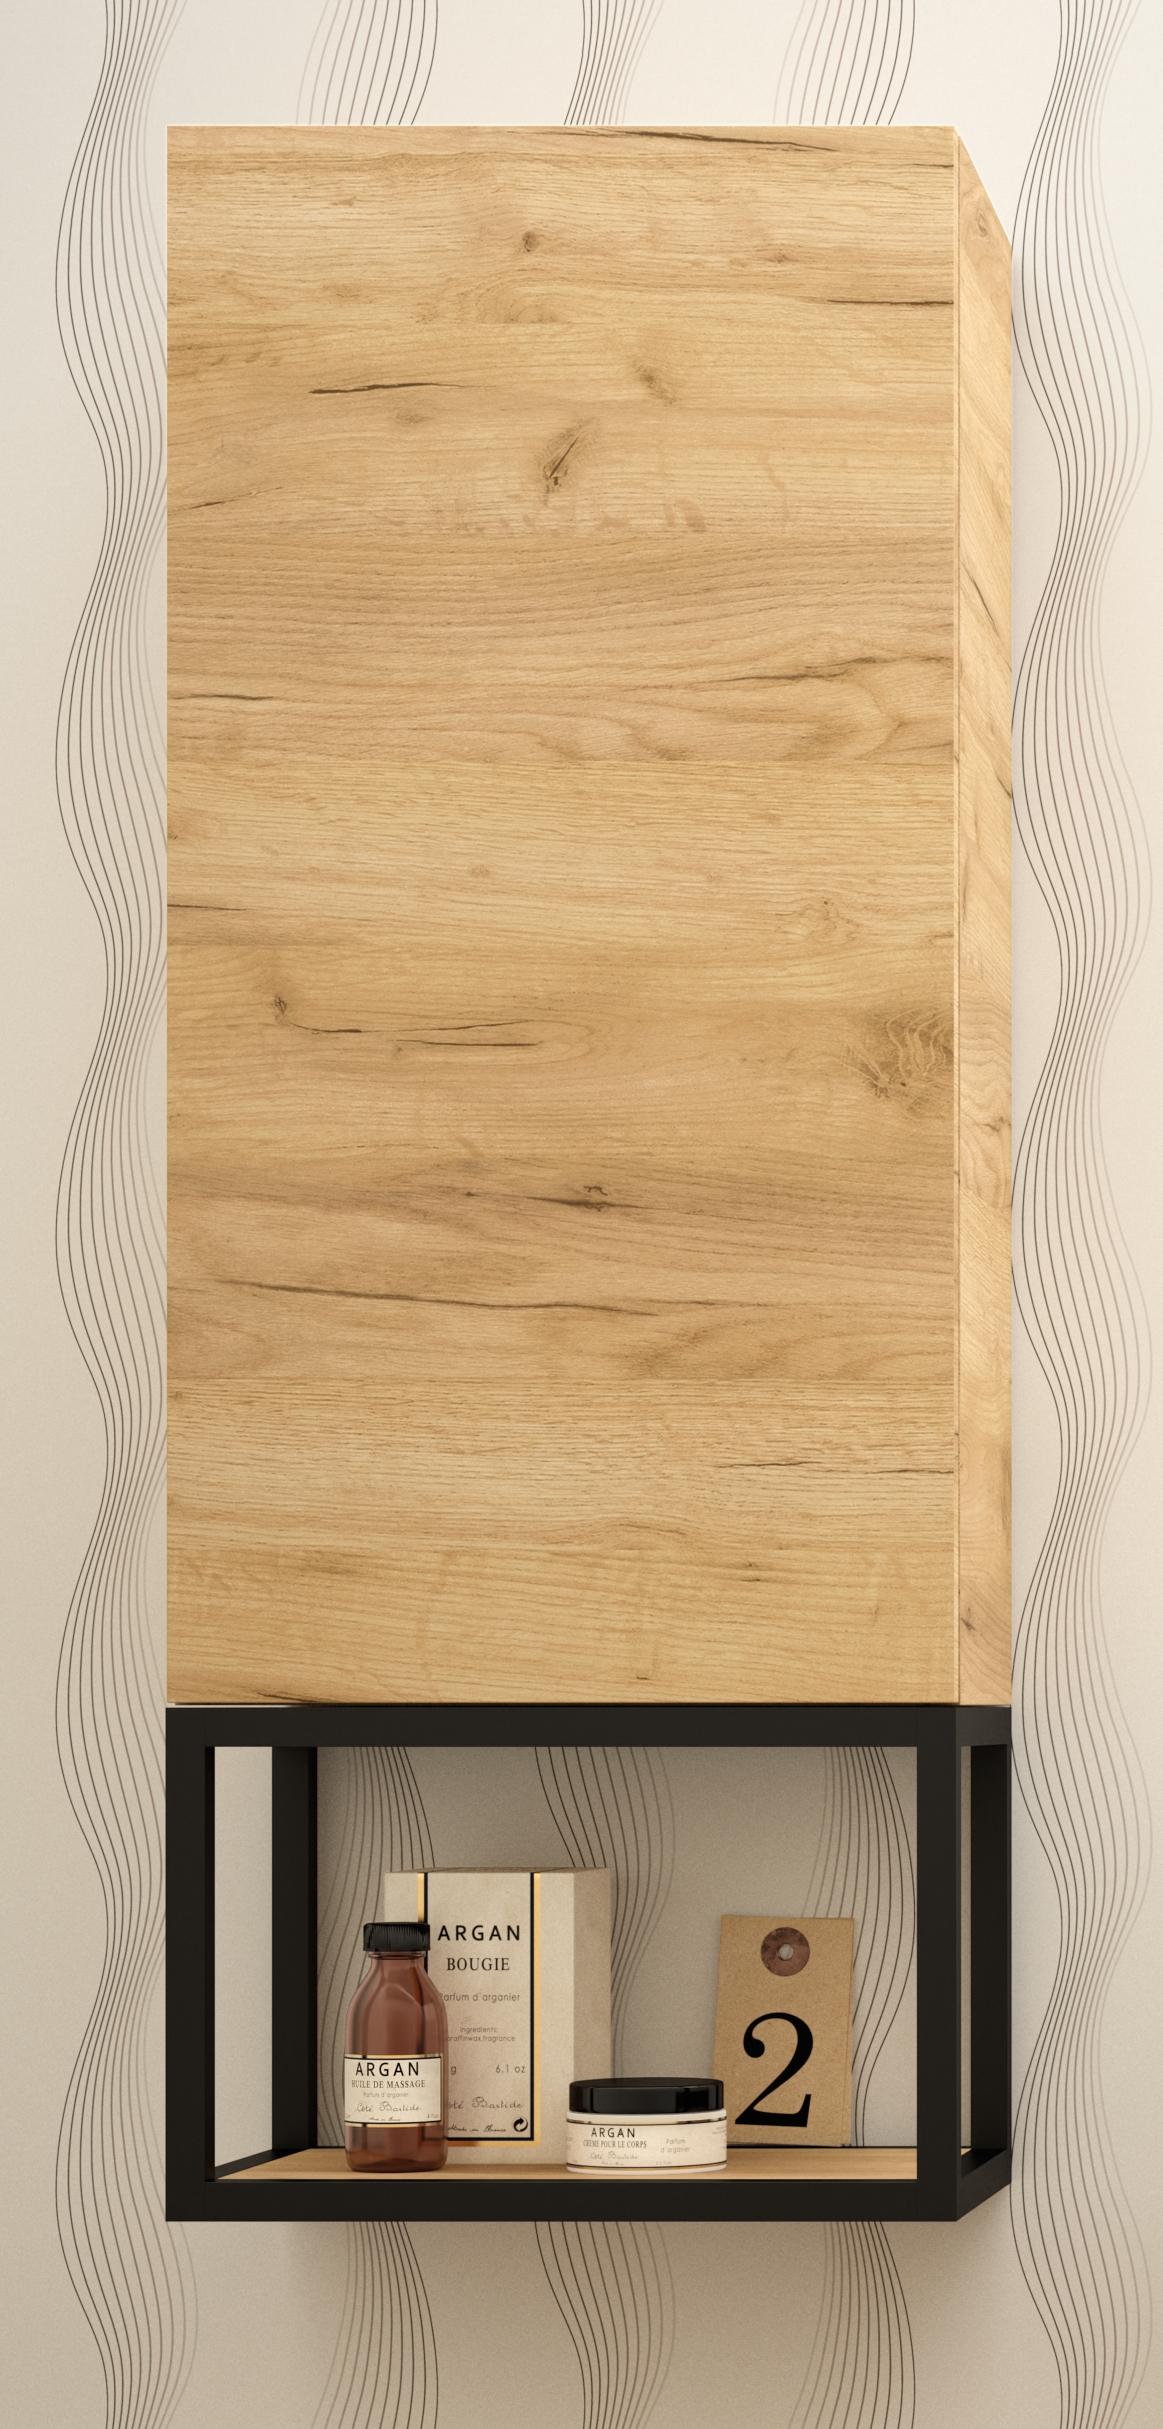 Muebles Davinci badkamerkast 100cm met zwart frame en eiken afwerking